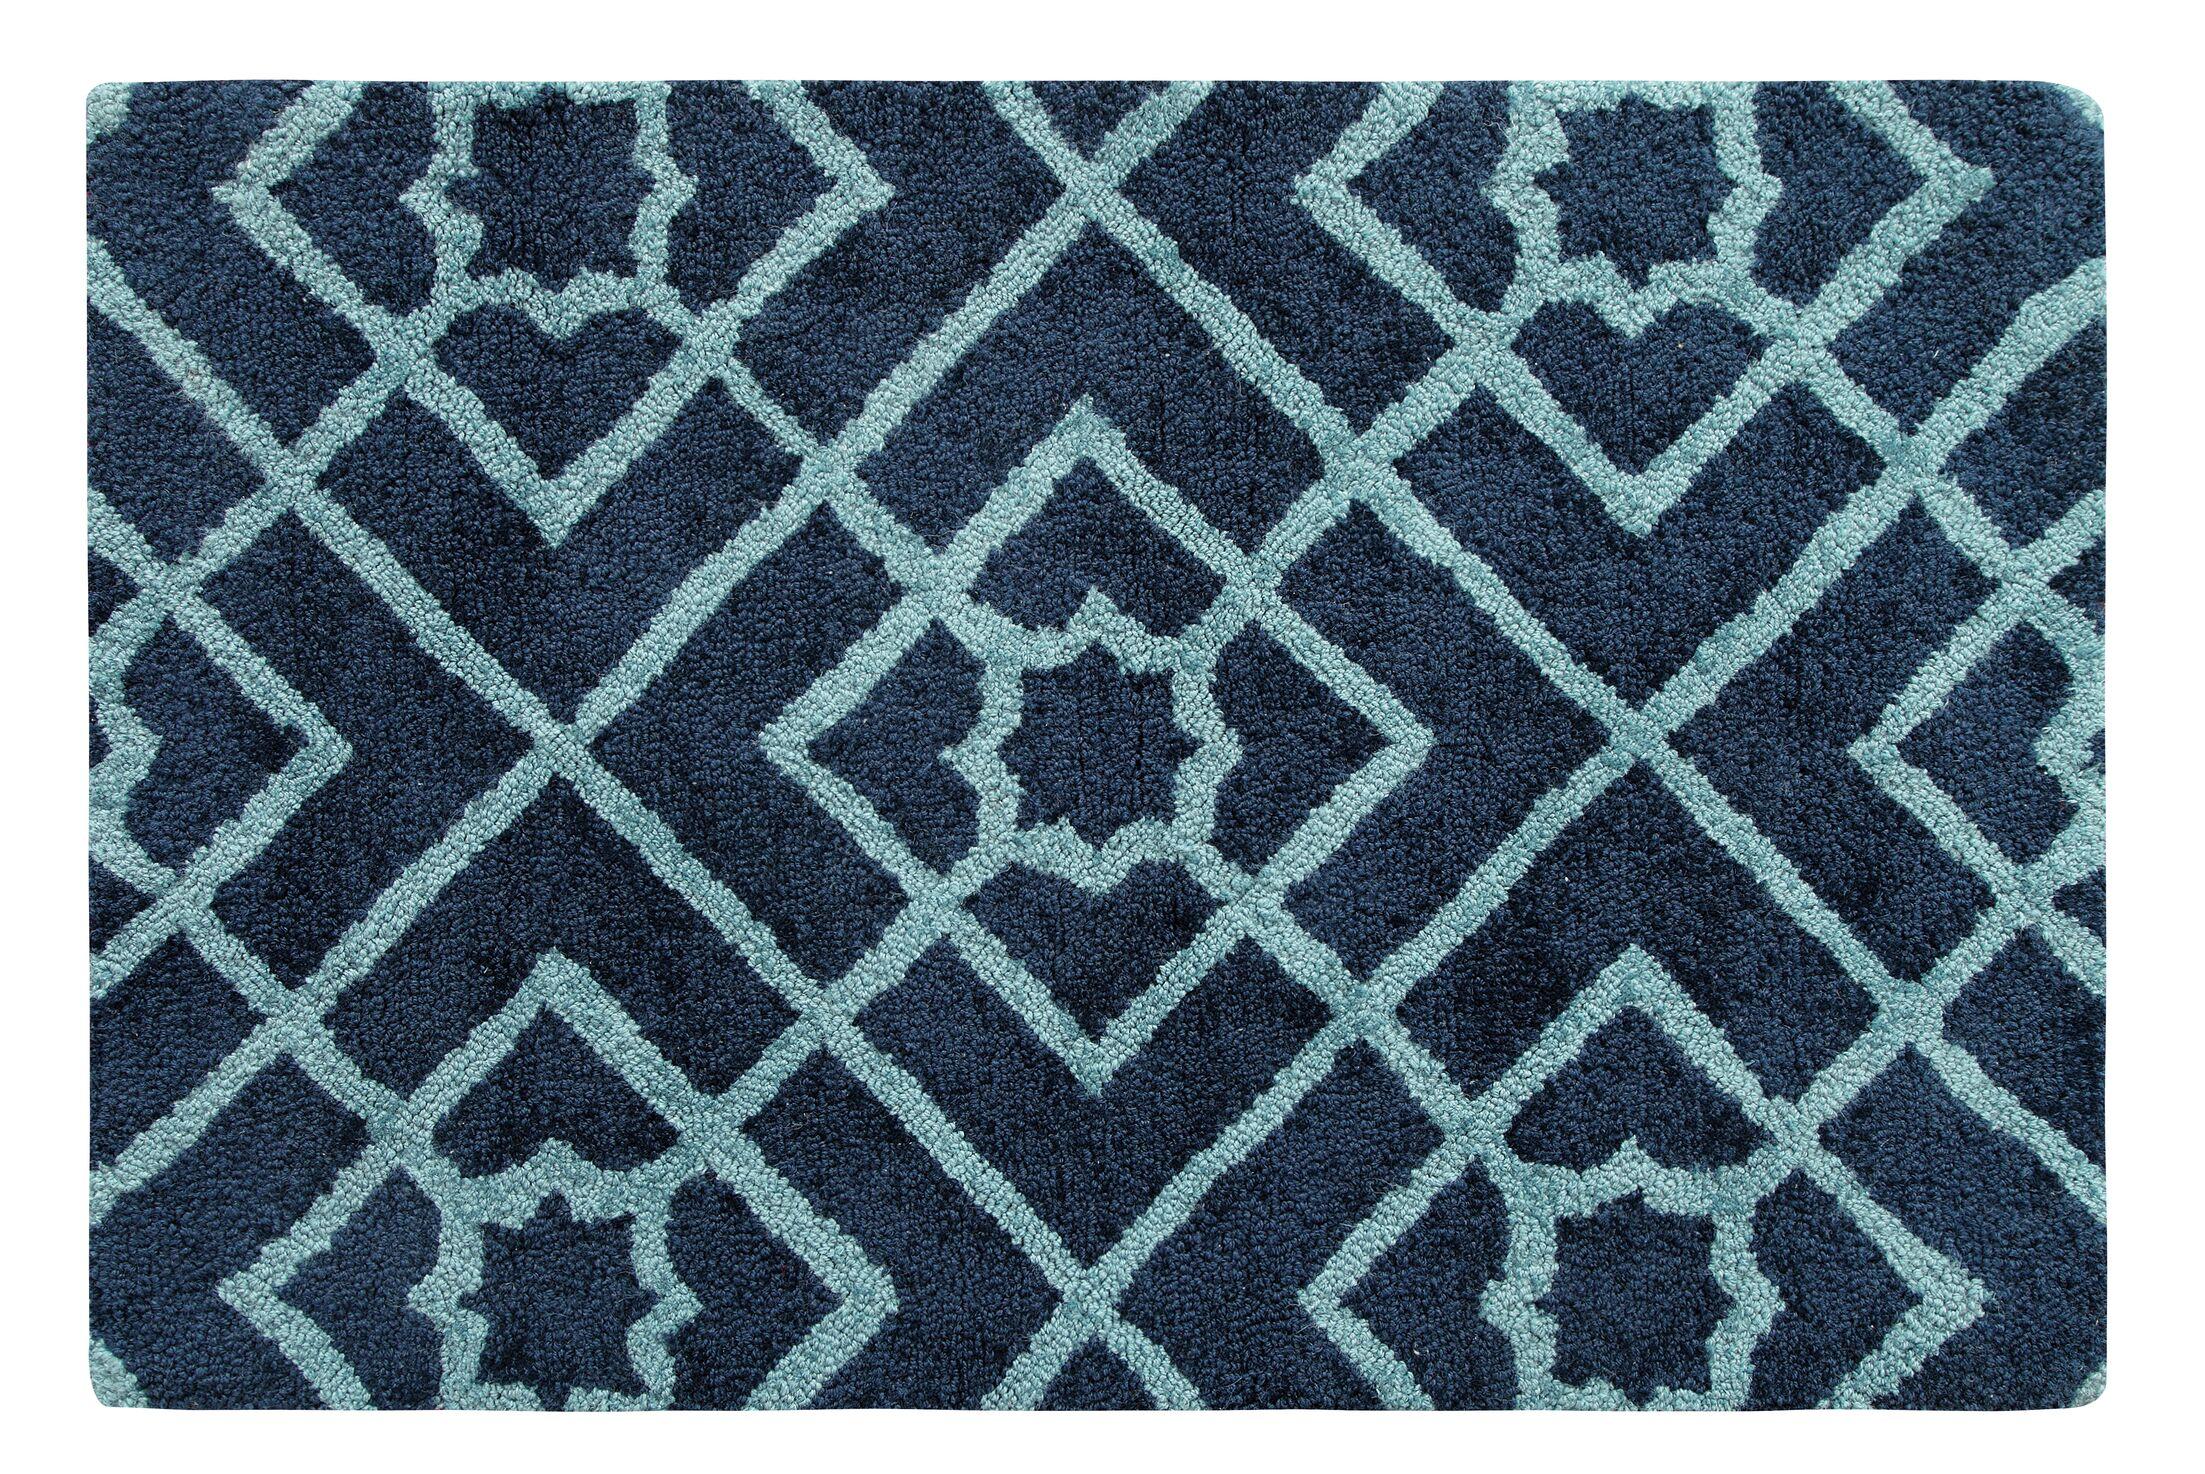 Diamond Lattice Hand-Tufted Navy Area Rug Rug Size: Rectangle 2' x 3'